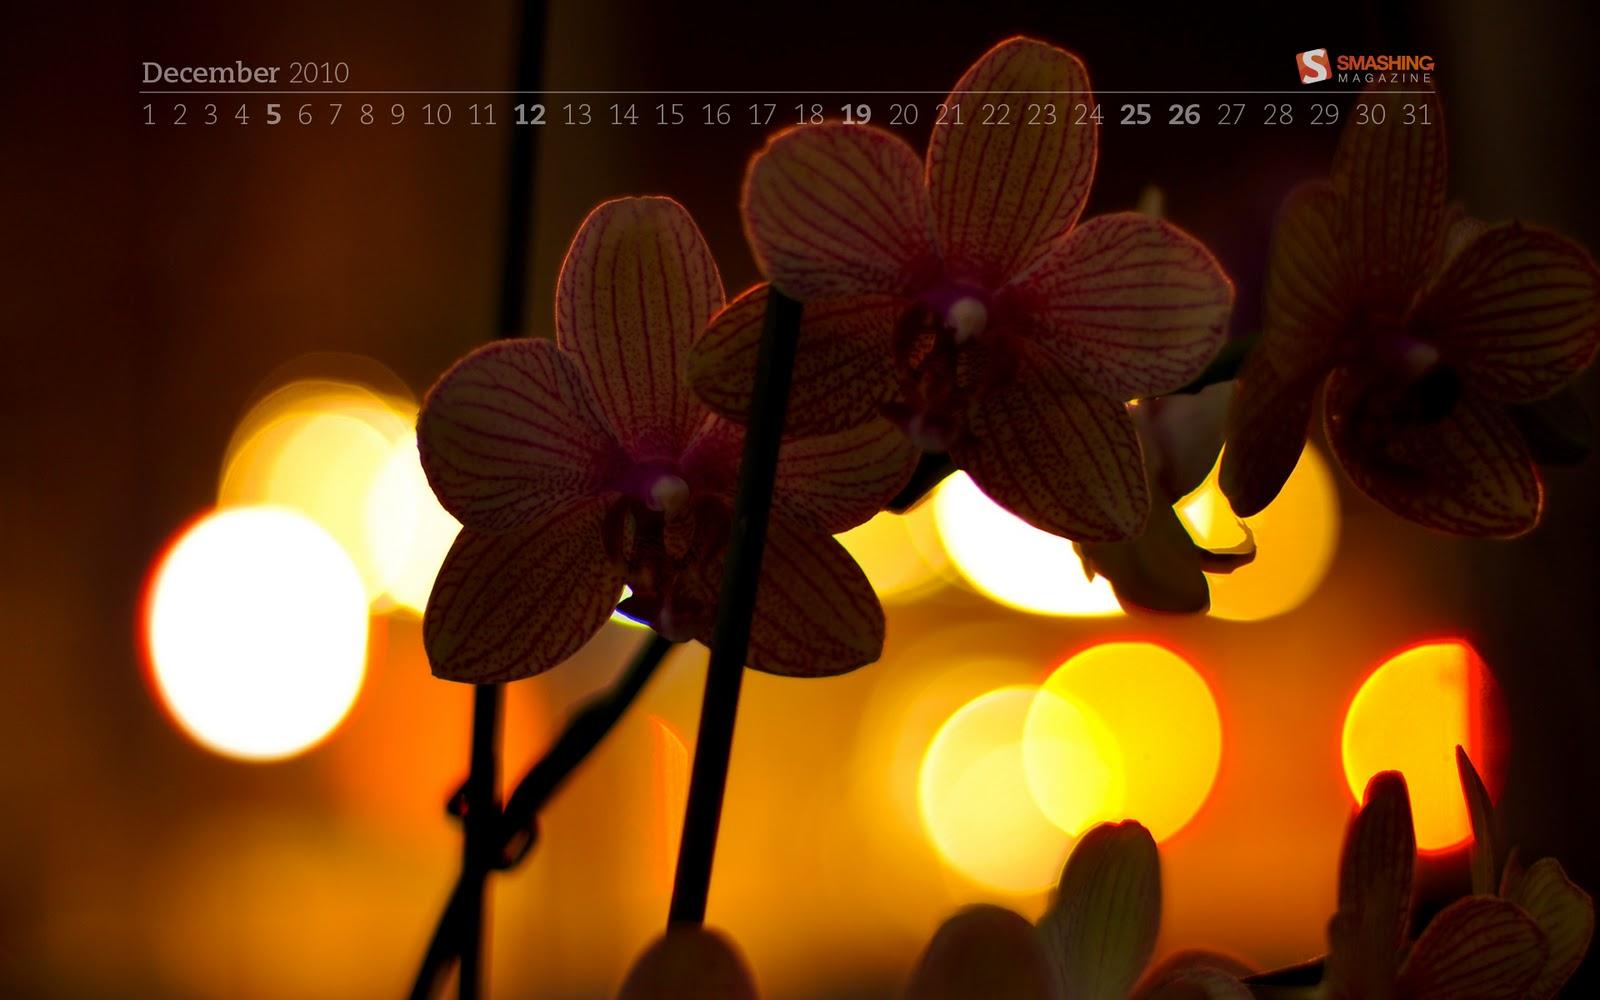 http://1.bp.blogspot.com/_3UZ_N8Qdang/TPcyn4Dm0aI/AAAAAAAAEjo/oQslUpL4i_I/s1600/december-10-flower_bokeh__57-calendar-1920x1200.jpg